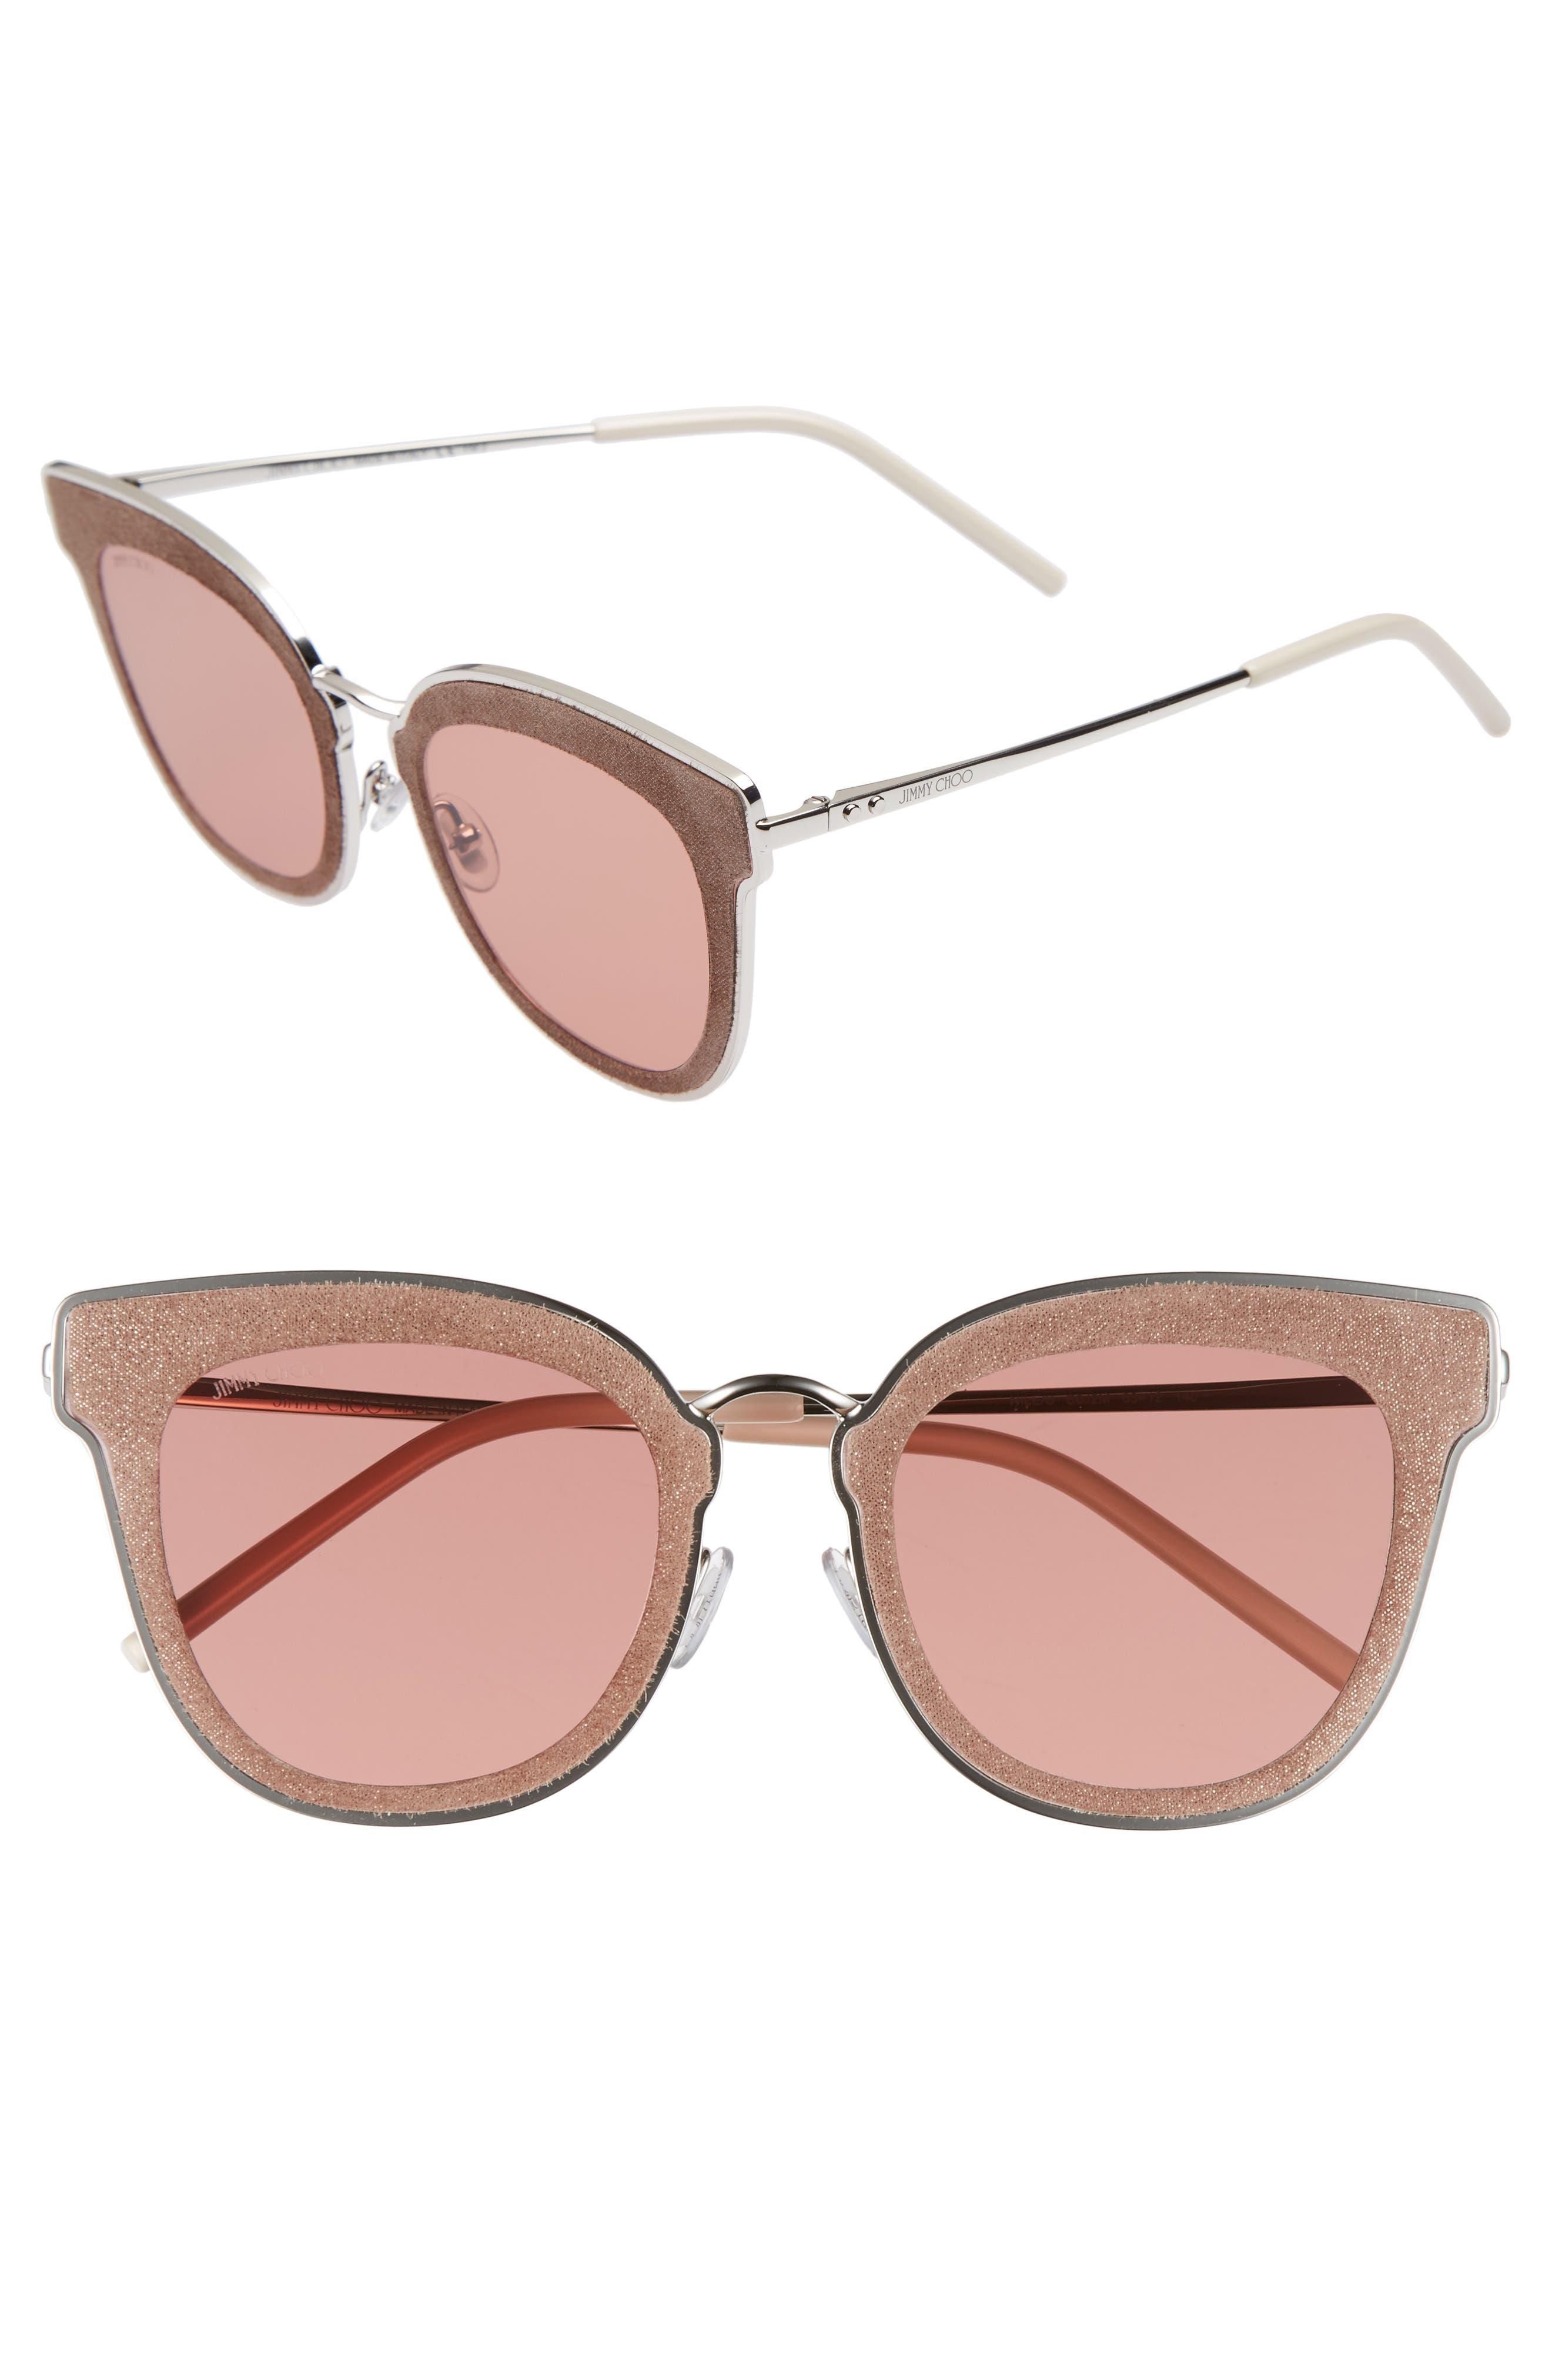 Main Image - Jimmy Choo Niles 63mm Oversize Cat Eye Sunglasses